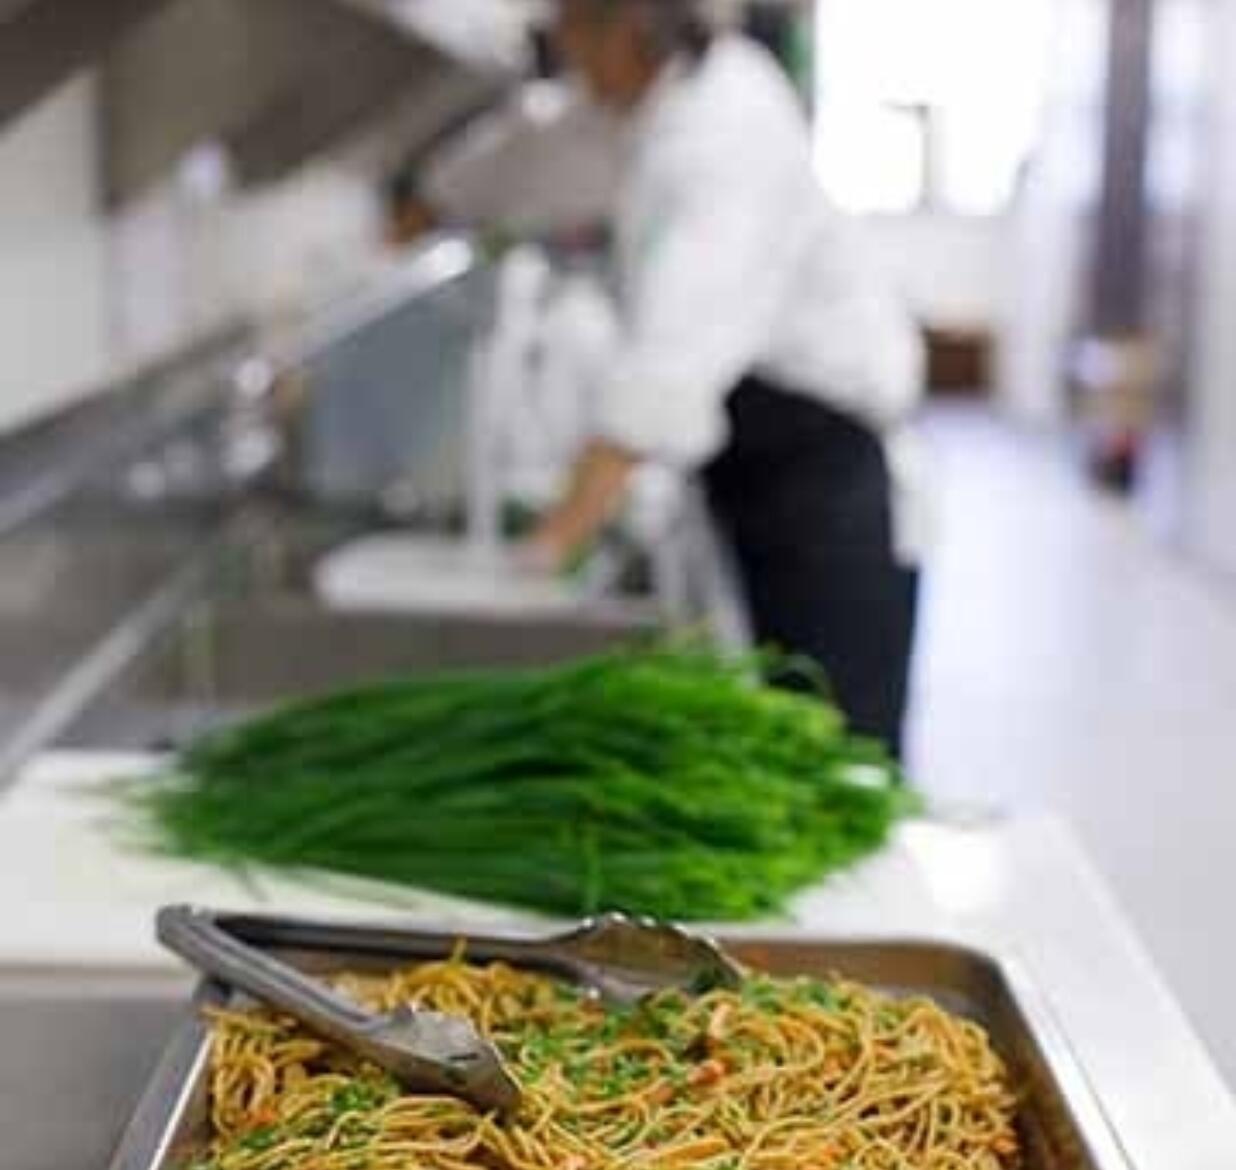 Chef Ann Foundation Nutrition Services Directors Deserve Our Thanks